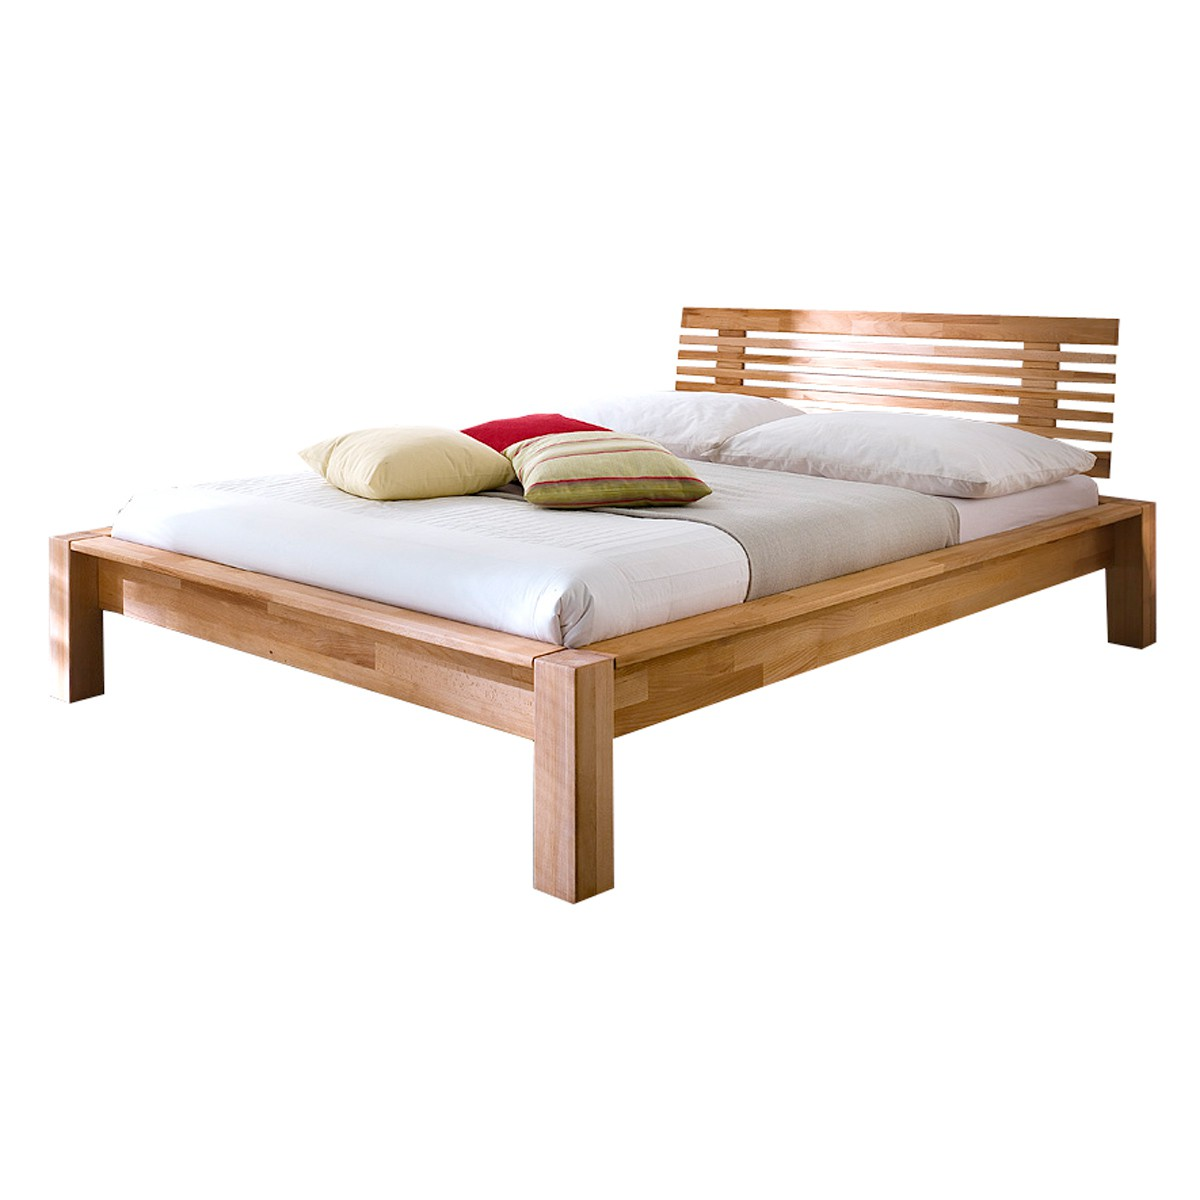 bett minas 140 x 200 cm in kernbuche massiv ge lt. Black Bedroom Furniture Sets. Home Design Ideas